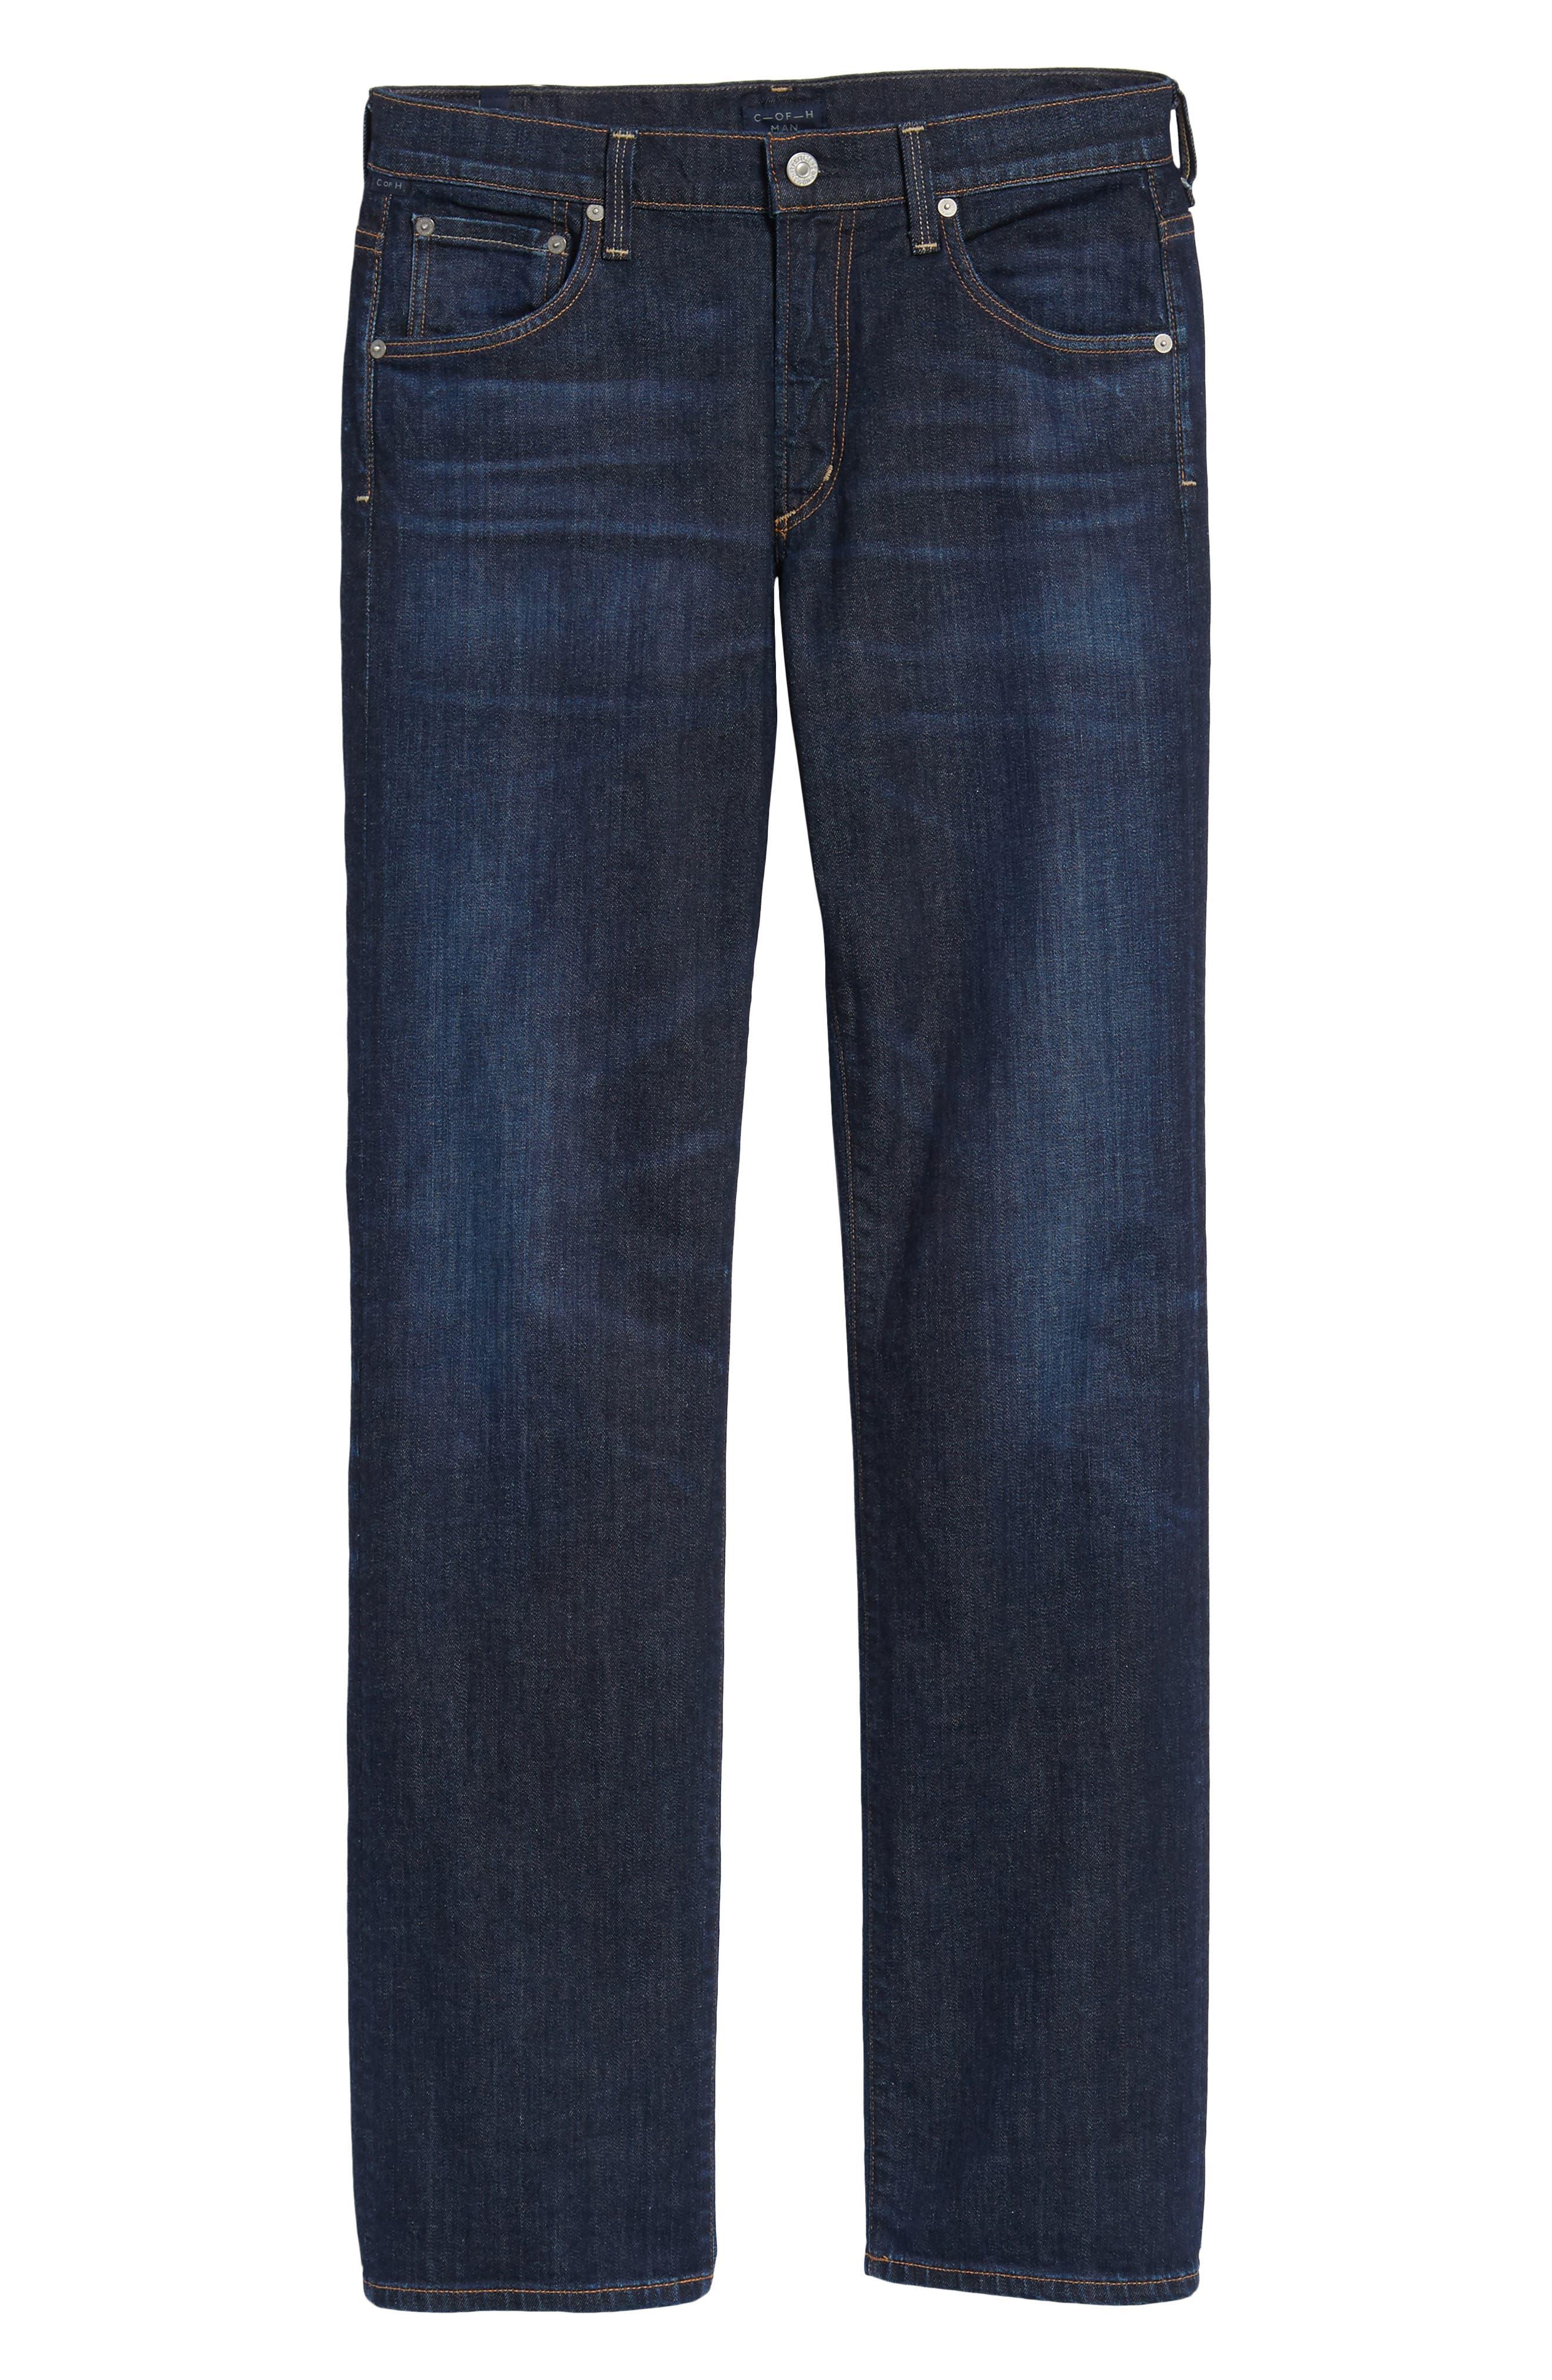 Sid Straight Leg Jeans,                             Alternate thumbnail 6, color,                             Emery